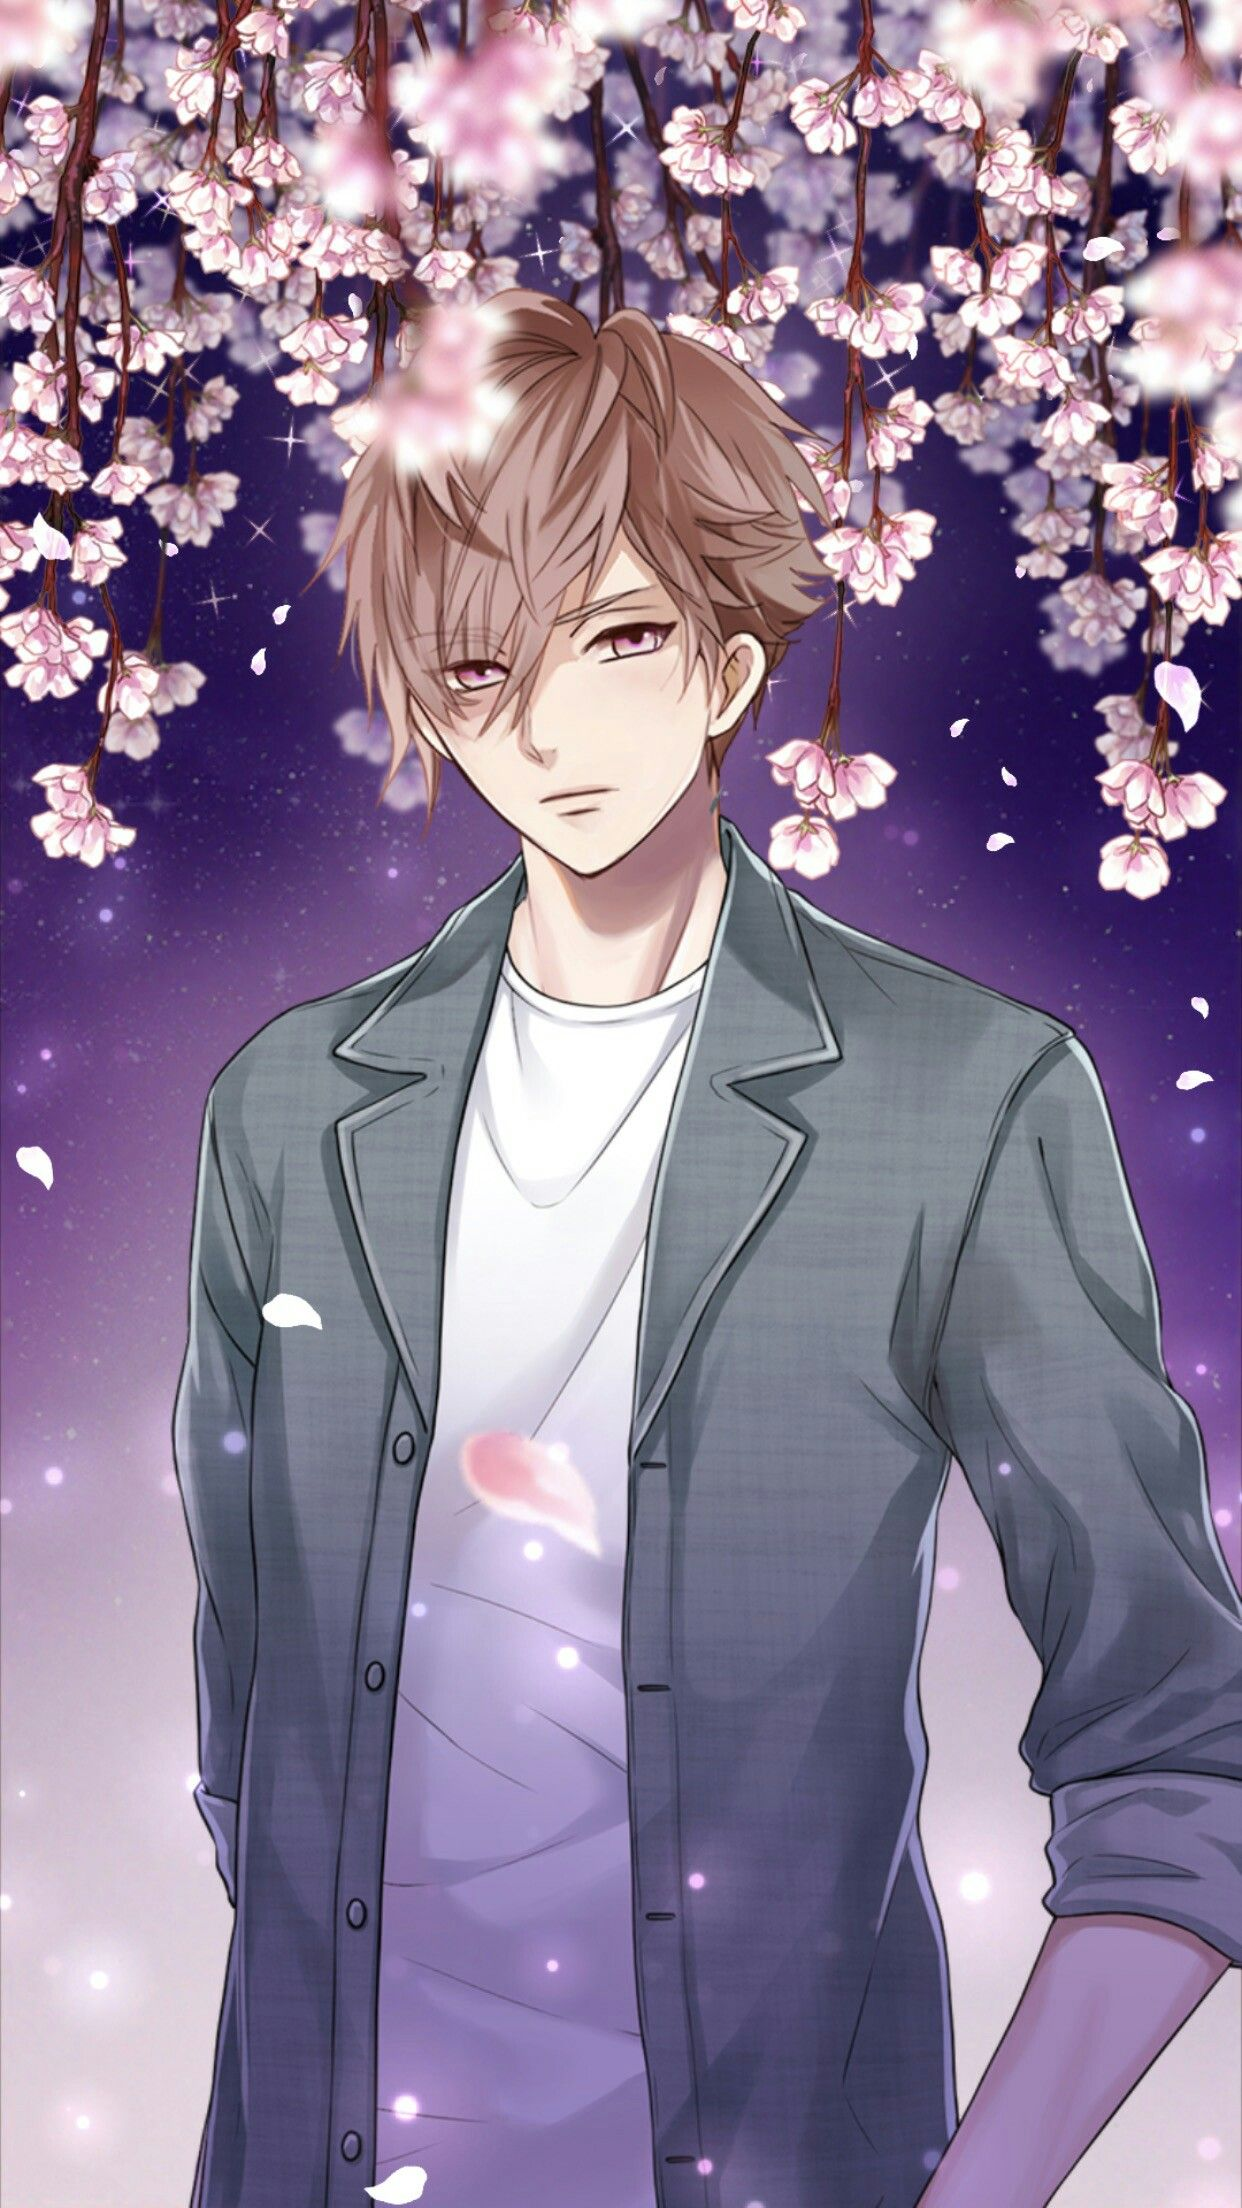 Anime stylish boy wallpaper